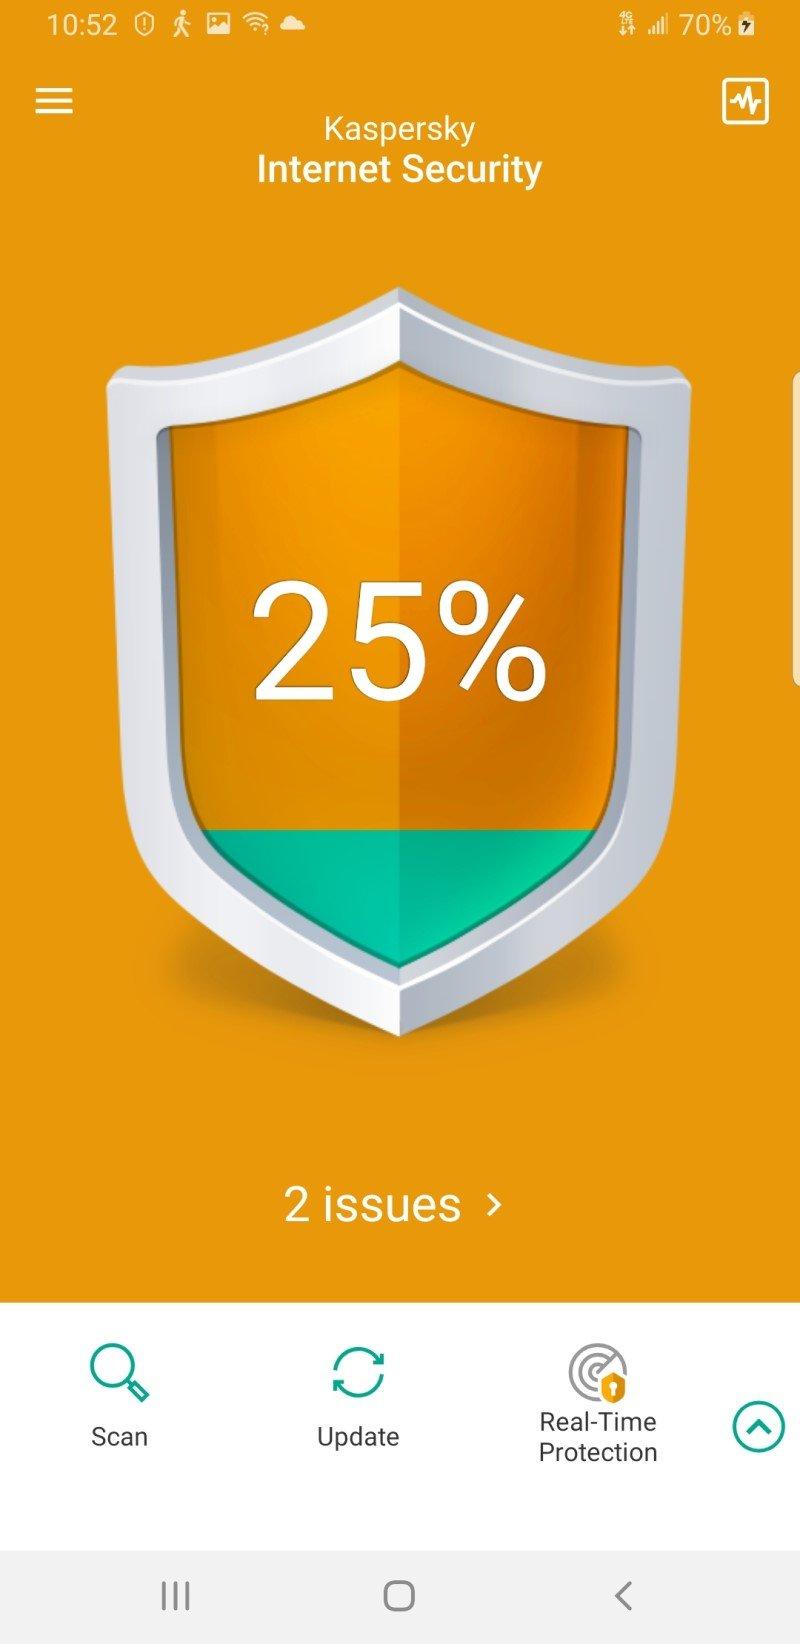 Kaspersky Mobile Antivirus Screenshot Edited